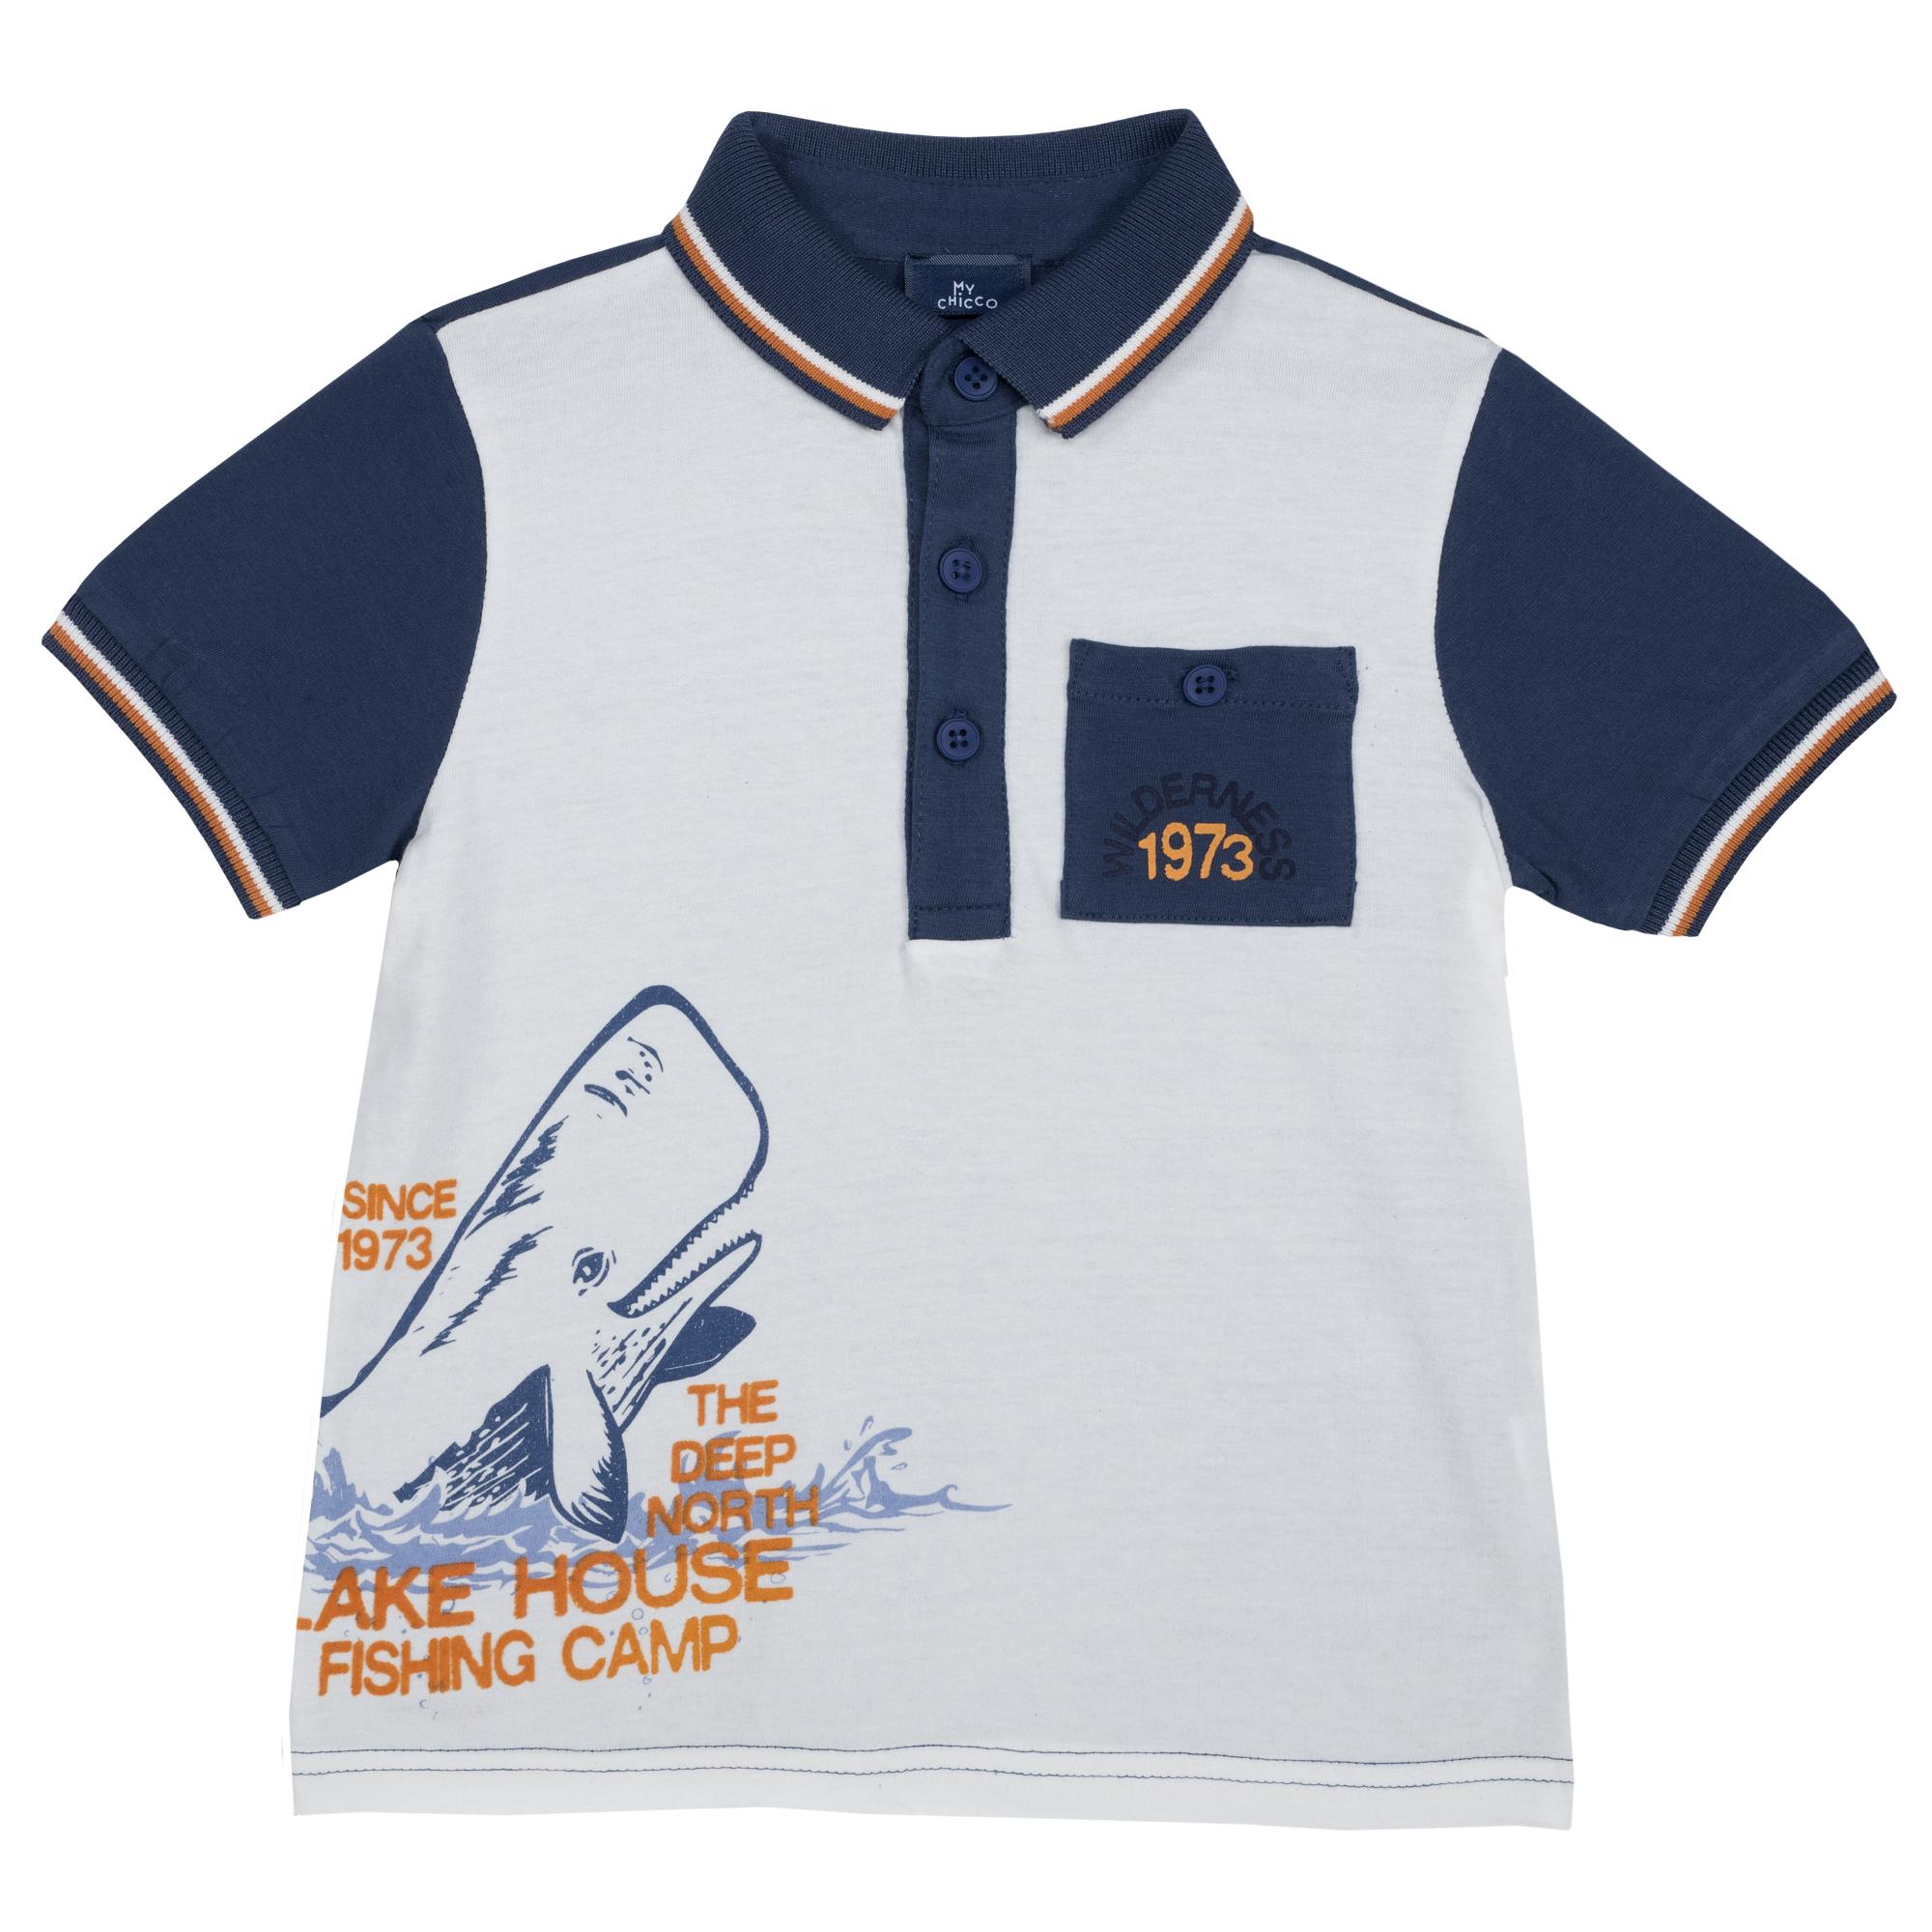 Tricou Polo Copii Chicco, Maneca Scurta, Albastru, 33499